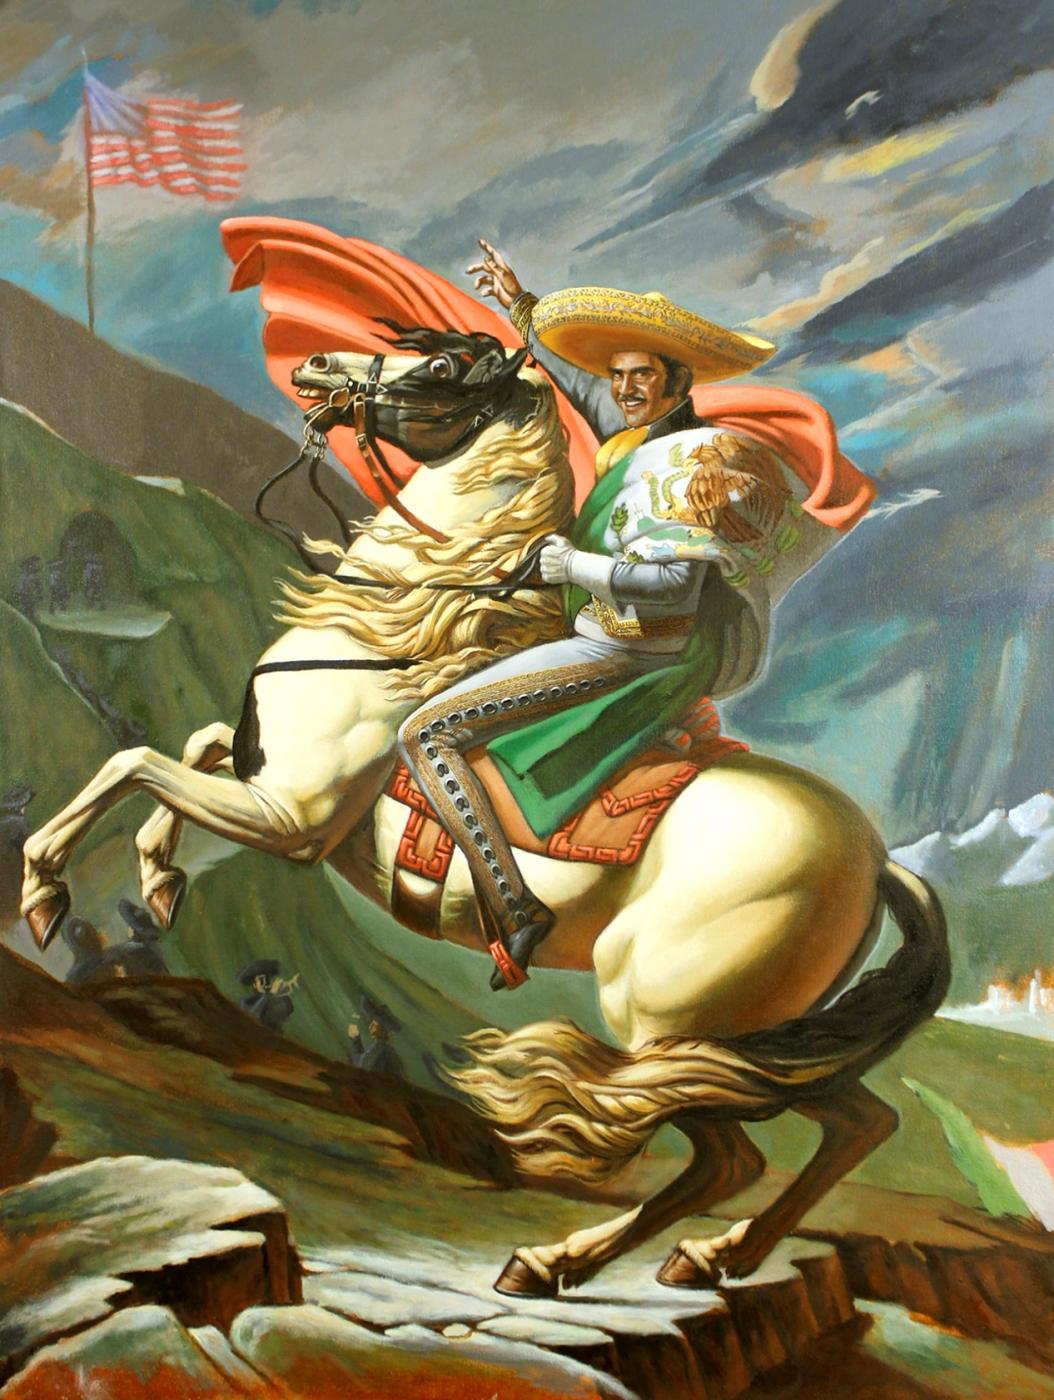 Conquista-ReConquista , 2016 Oil on canvas 40 x 30 inches Courtesy of the Artist.